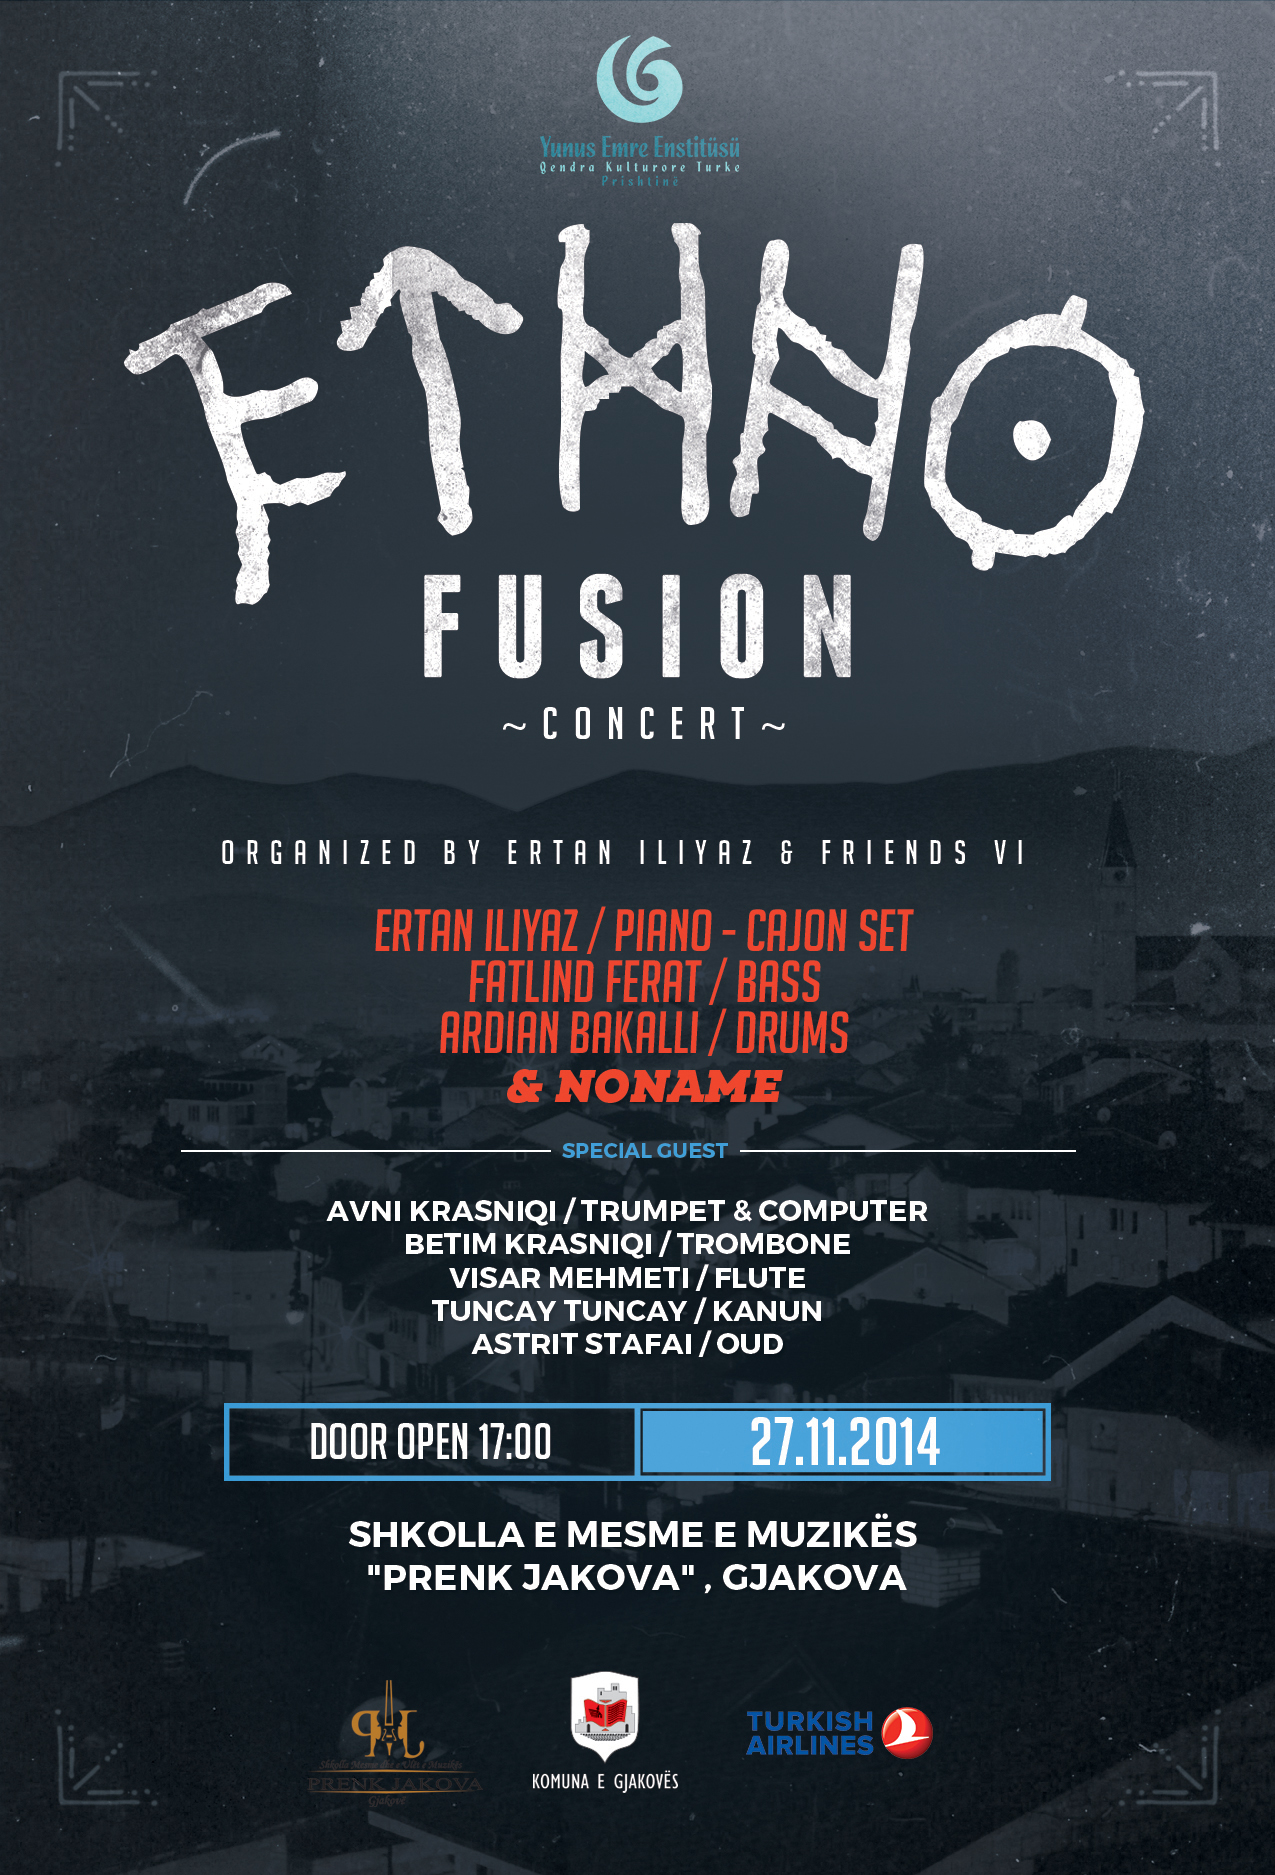 ethno_fusion